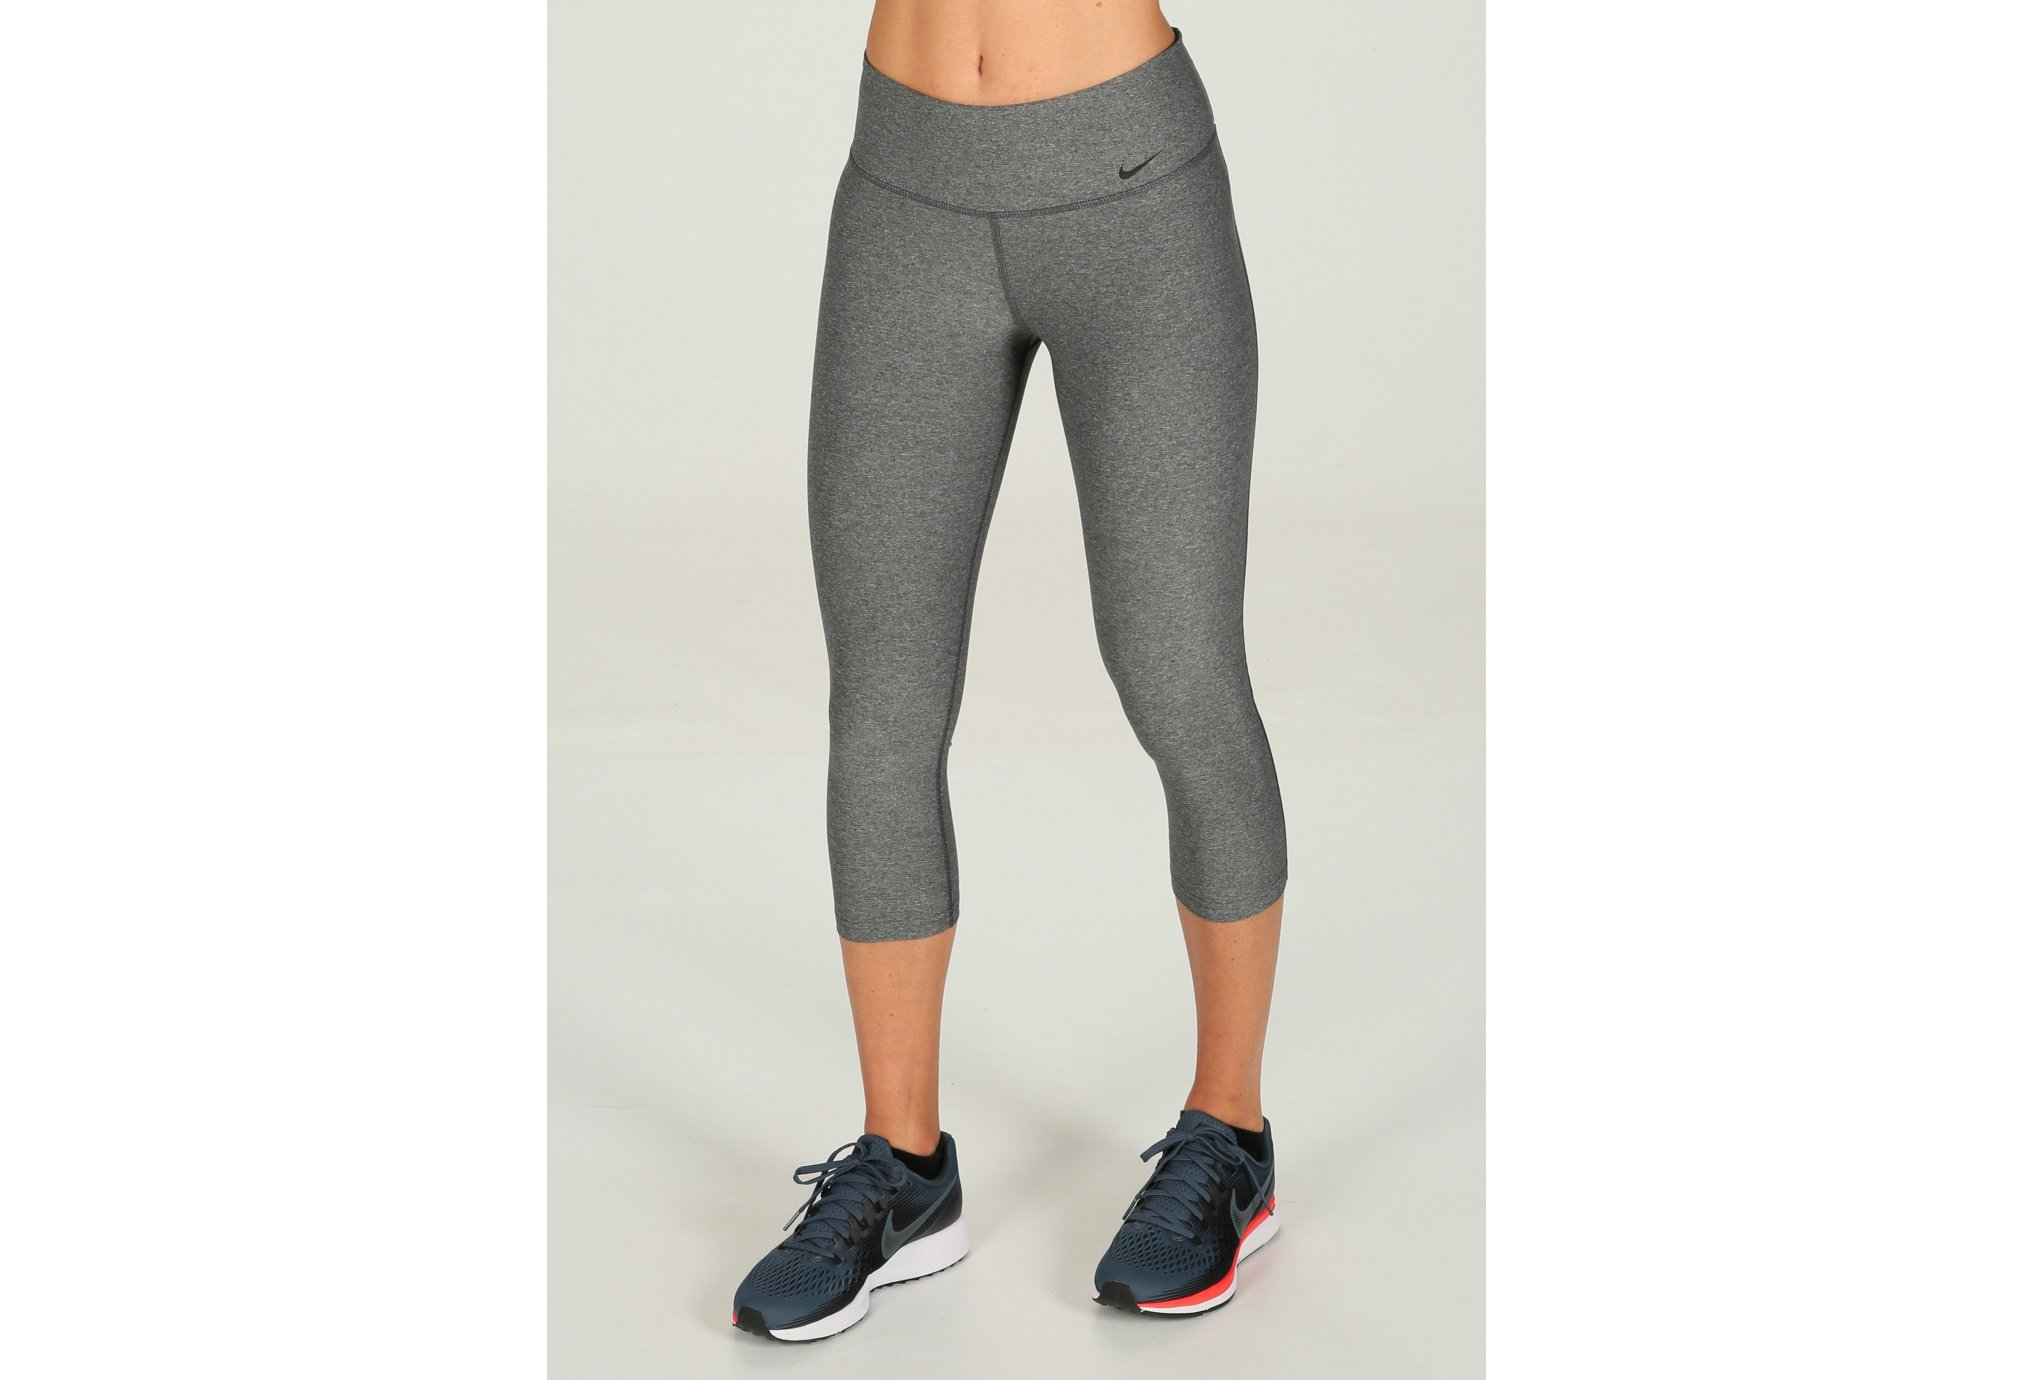 Nike Corsaire Legend 2.0 Tight Poly W vêtement running femme